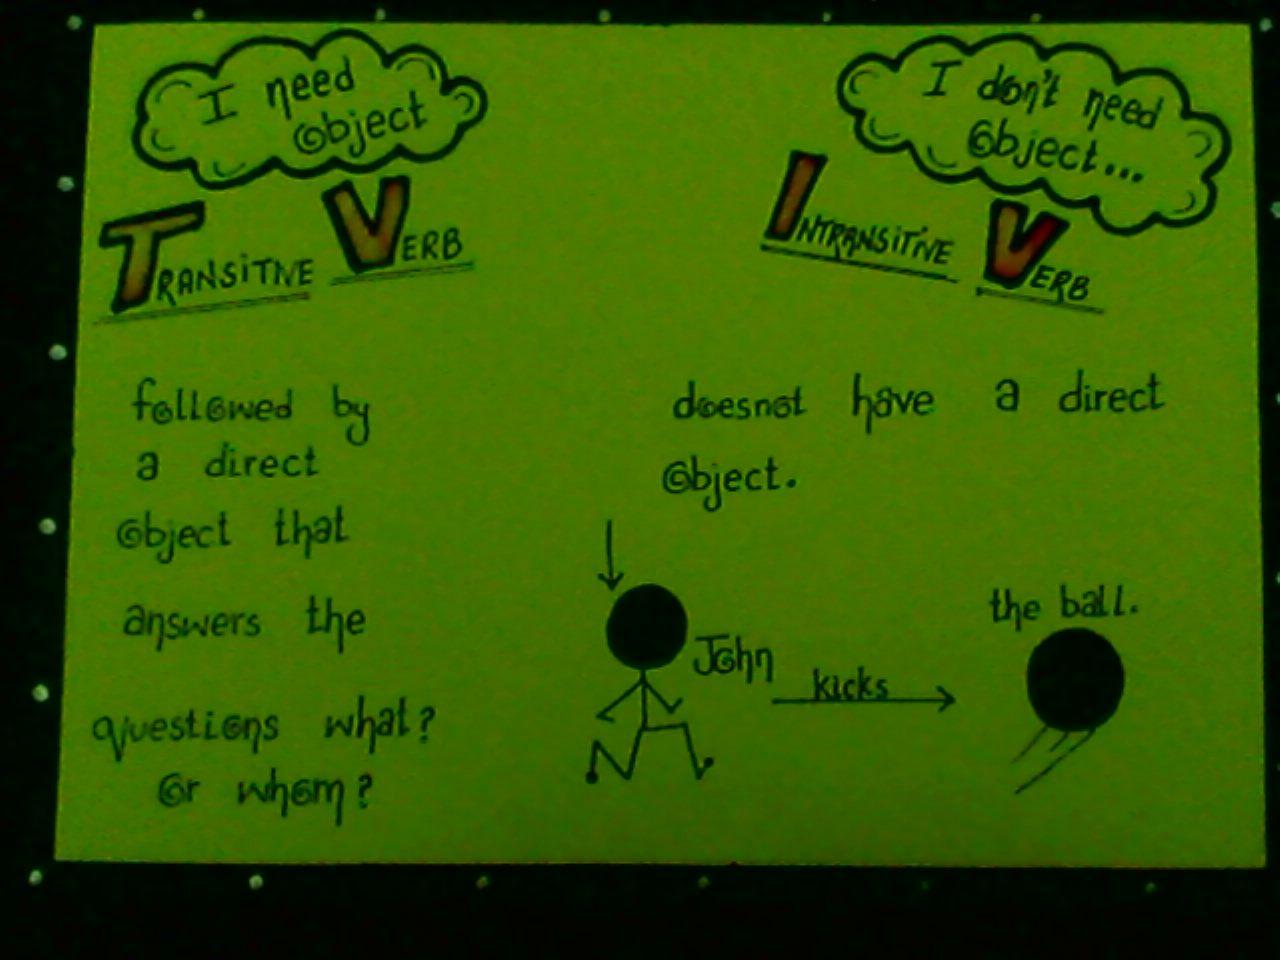 Uncategorized Transitive And Intransitive Verbs Worksheet 14 best verbs images on pinterest transitive and intransitive verb